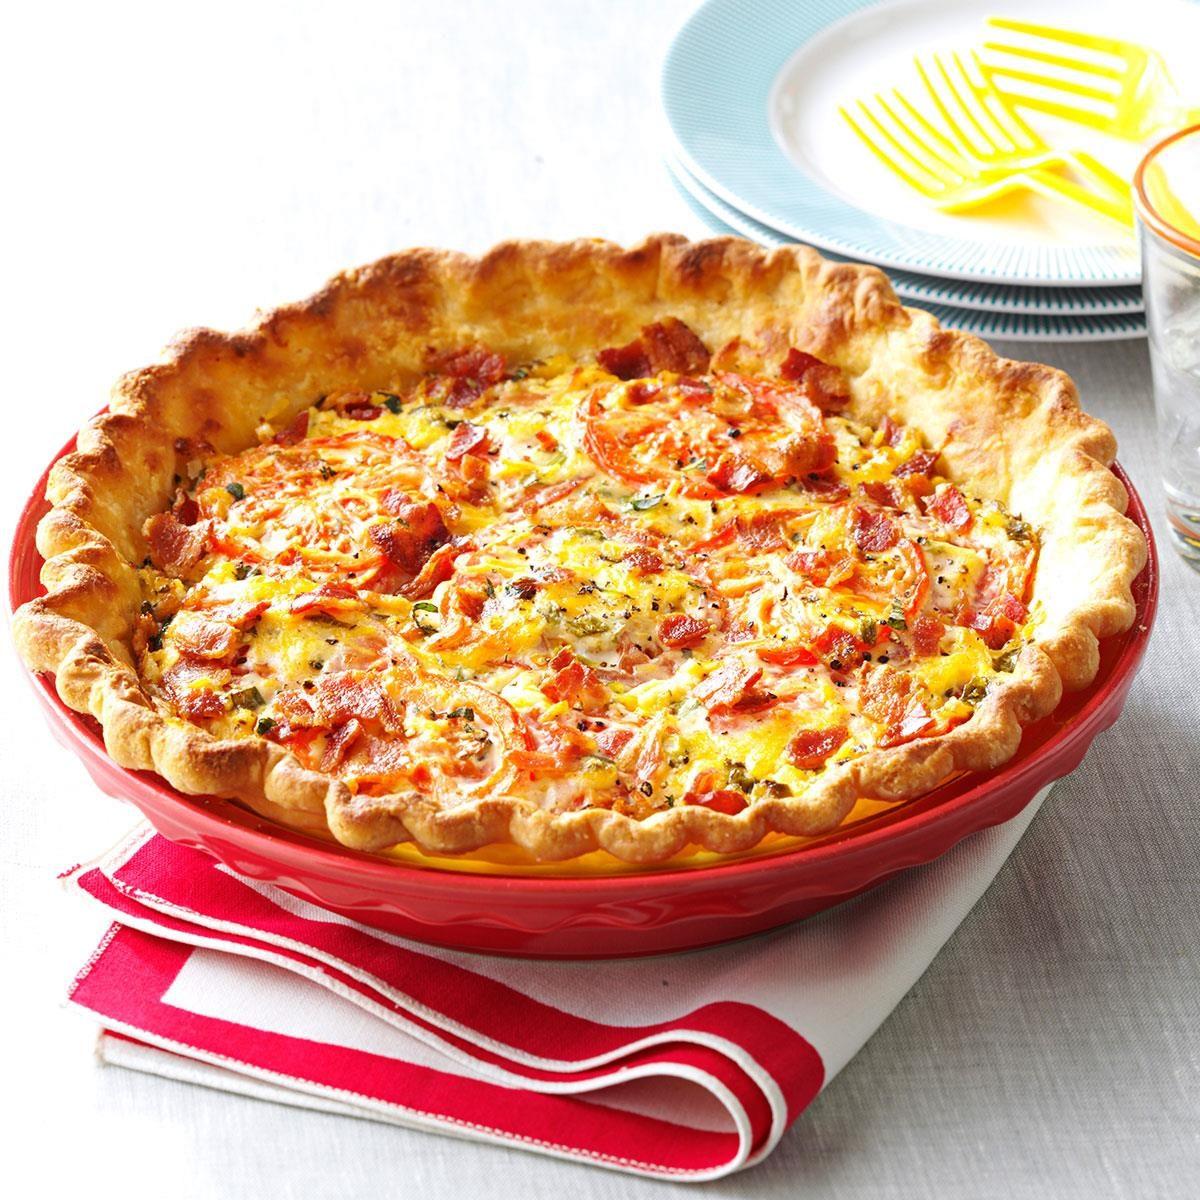 Tomato Pie Recipe | Taste of Home